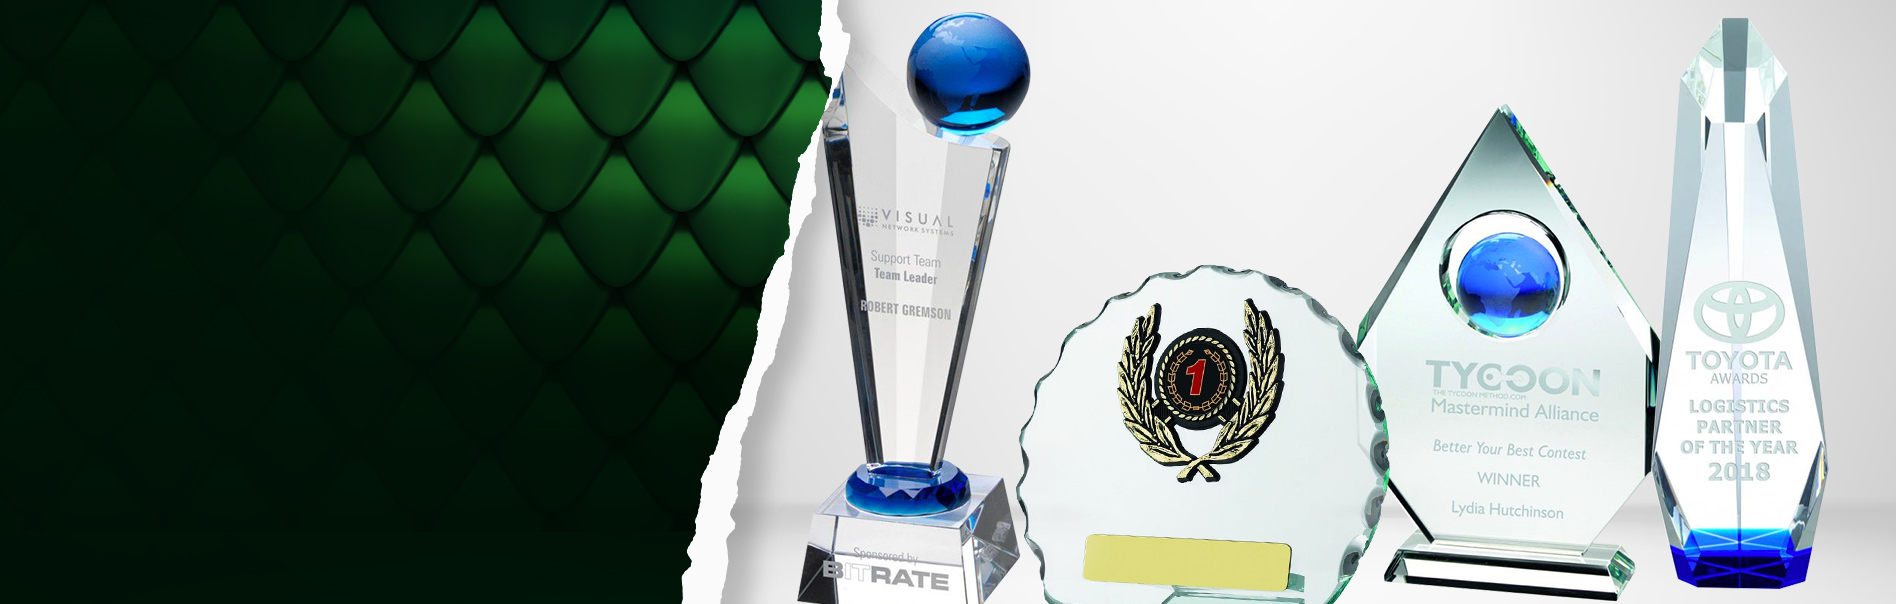 Snooker Colour-Curve Jade Crystal Trophy Award 200mm FREE Engraving